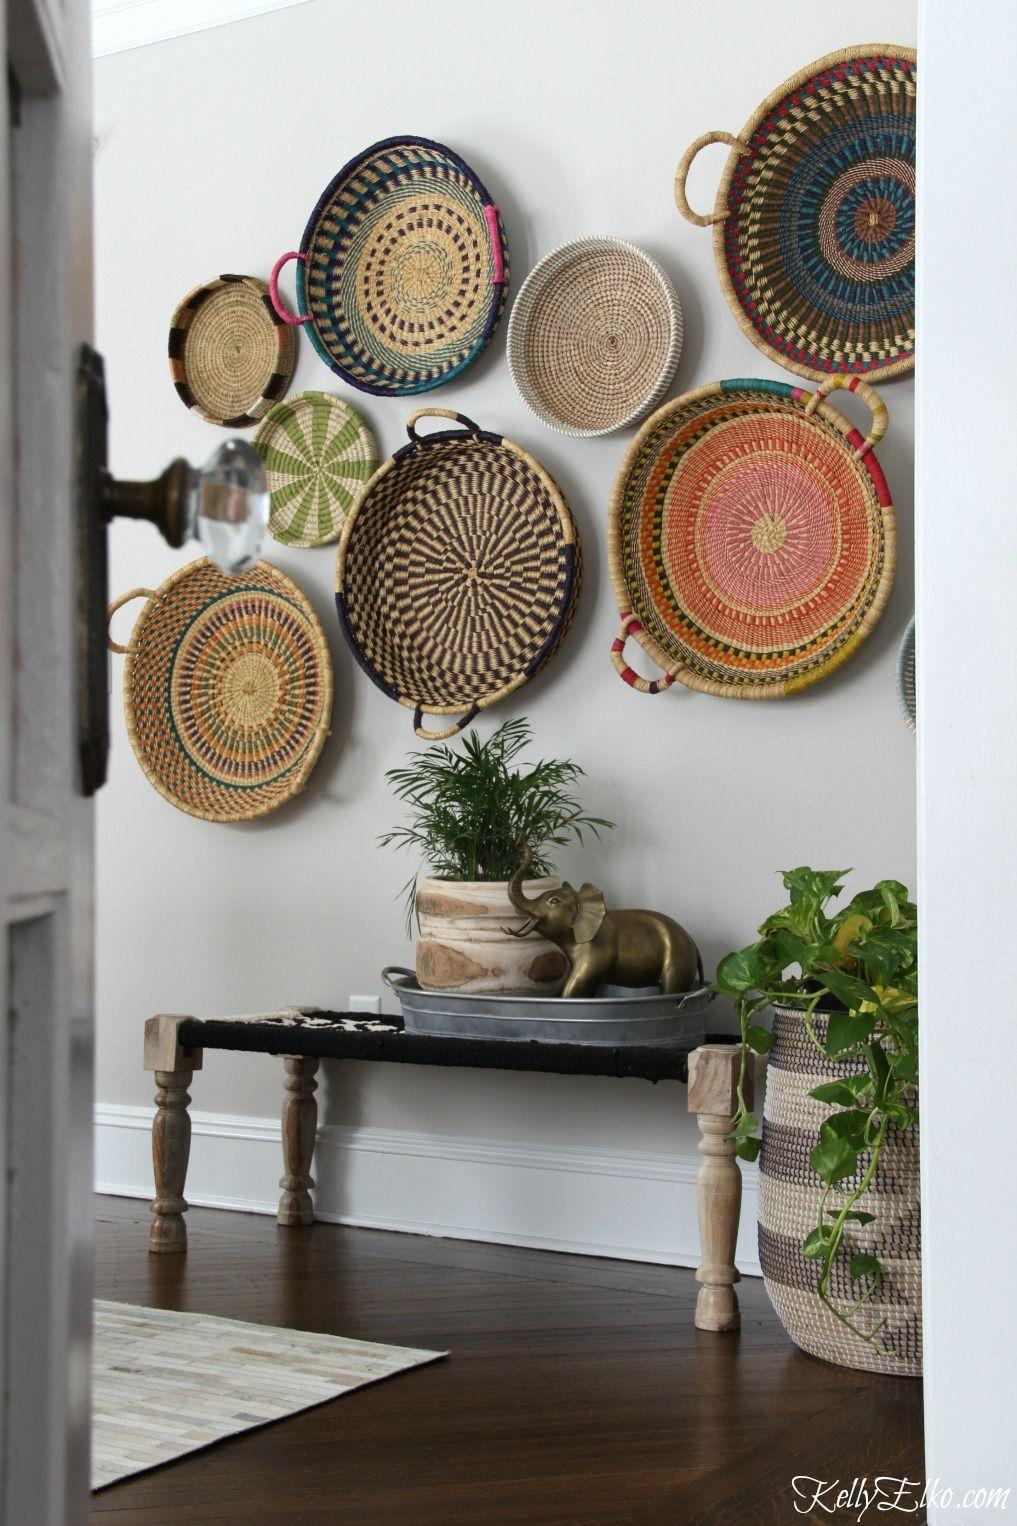 Colorful Basket Gallery Wall | Wall art decor | Pinterest ...